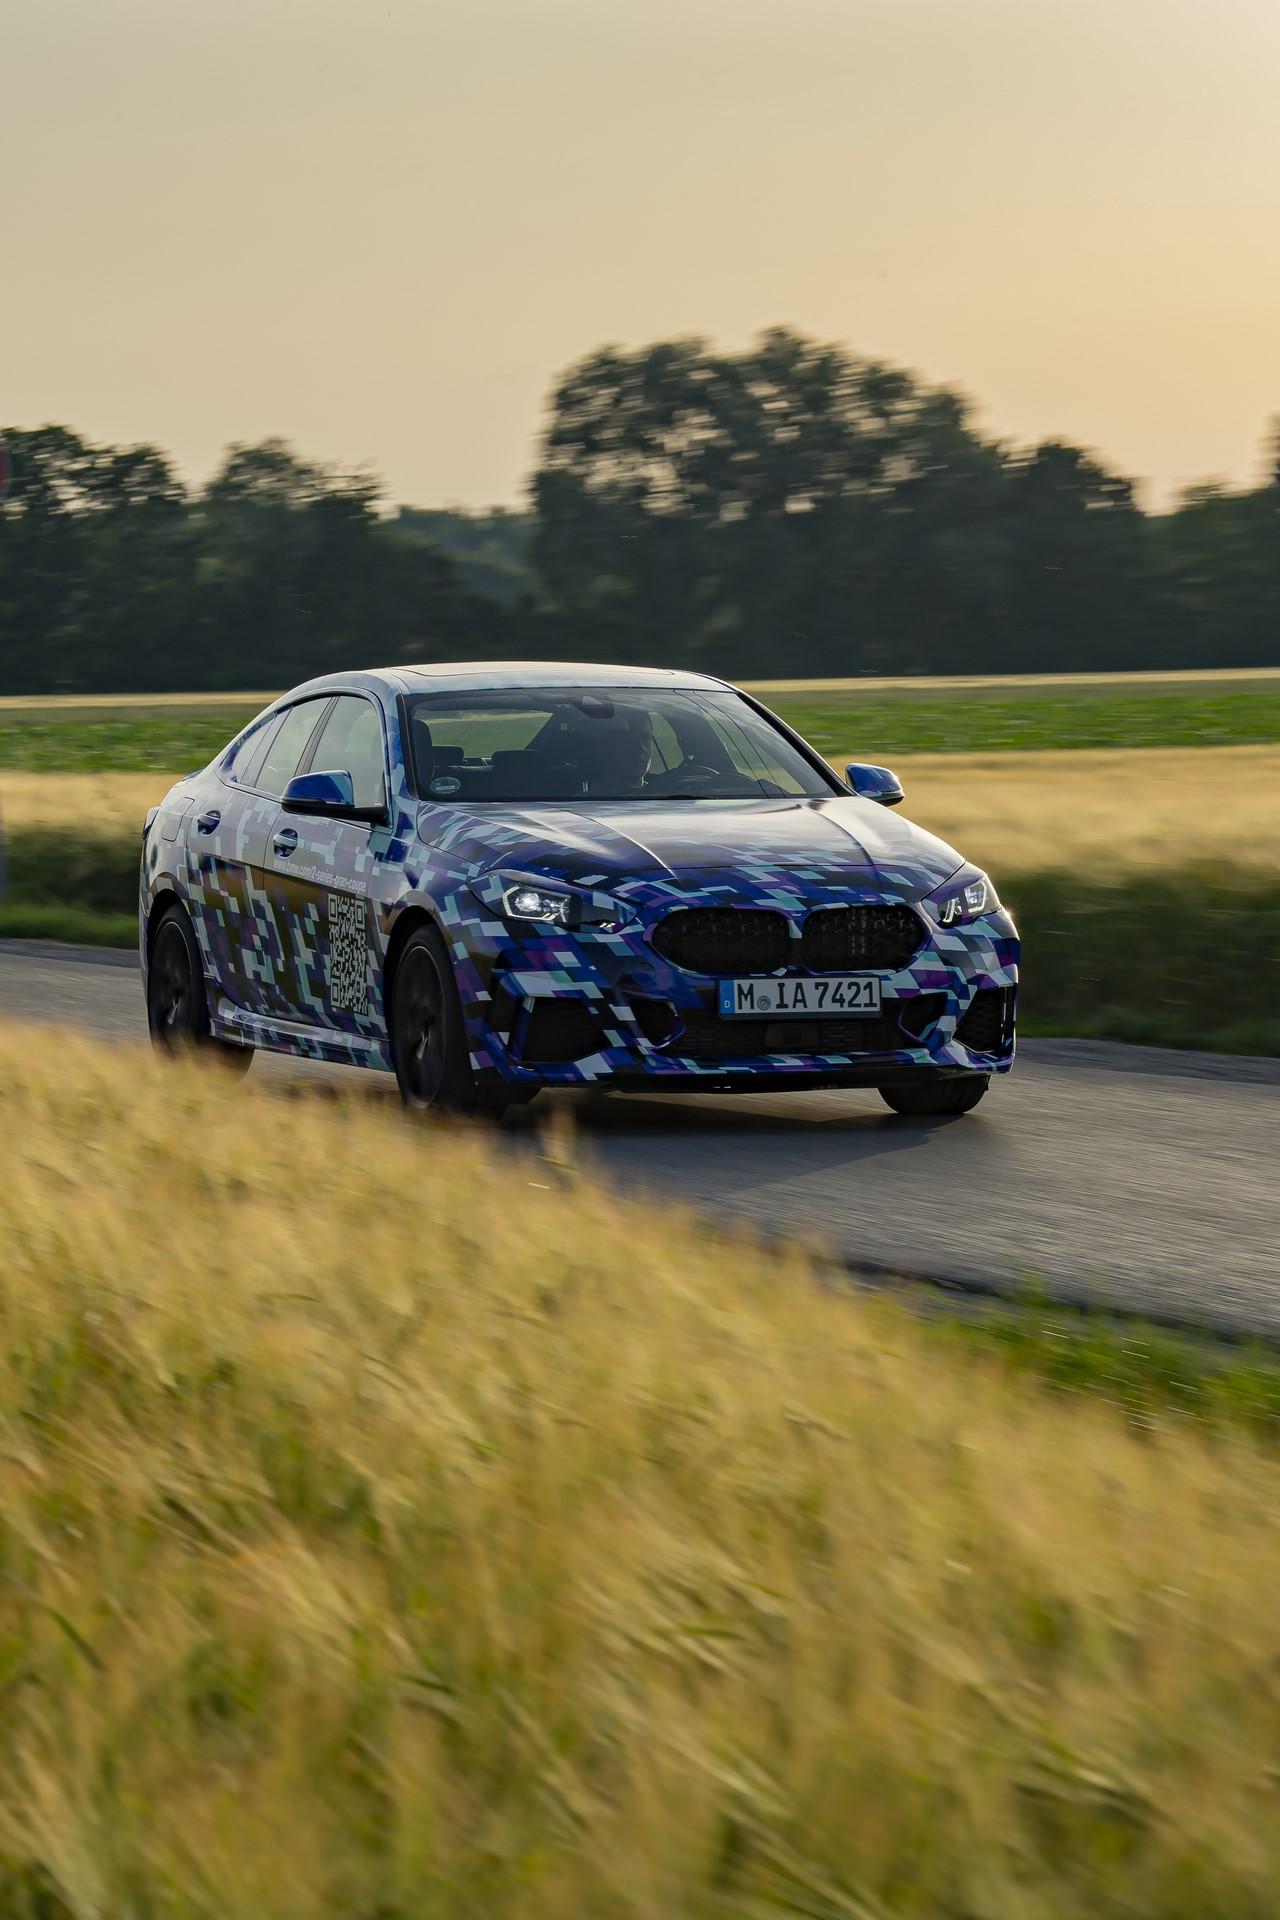 BMW-2-Series-Gran-Coupe-2020-spy-photos-18